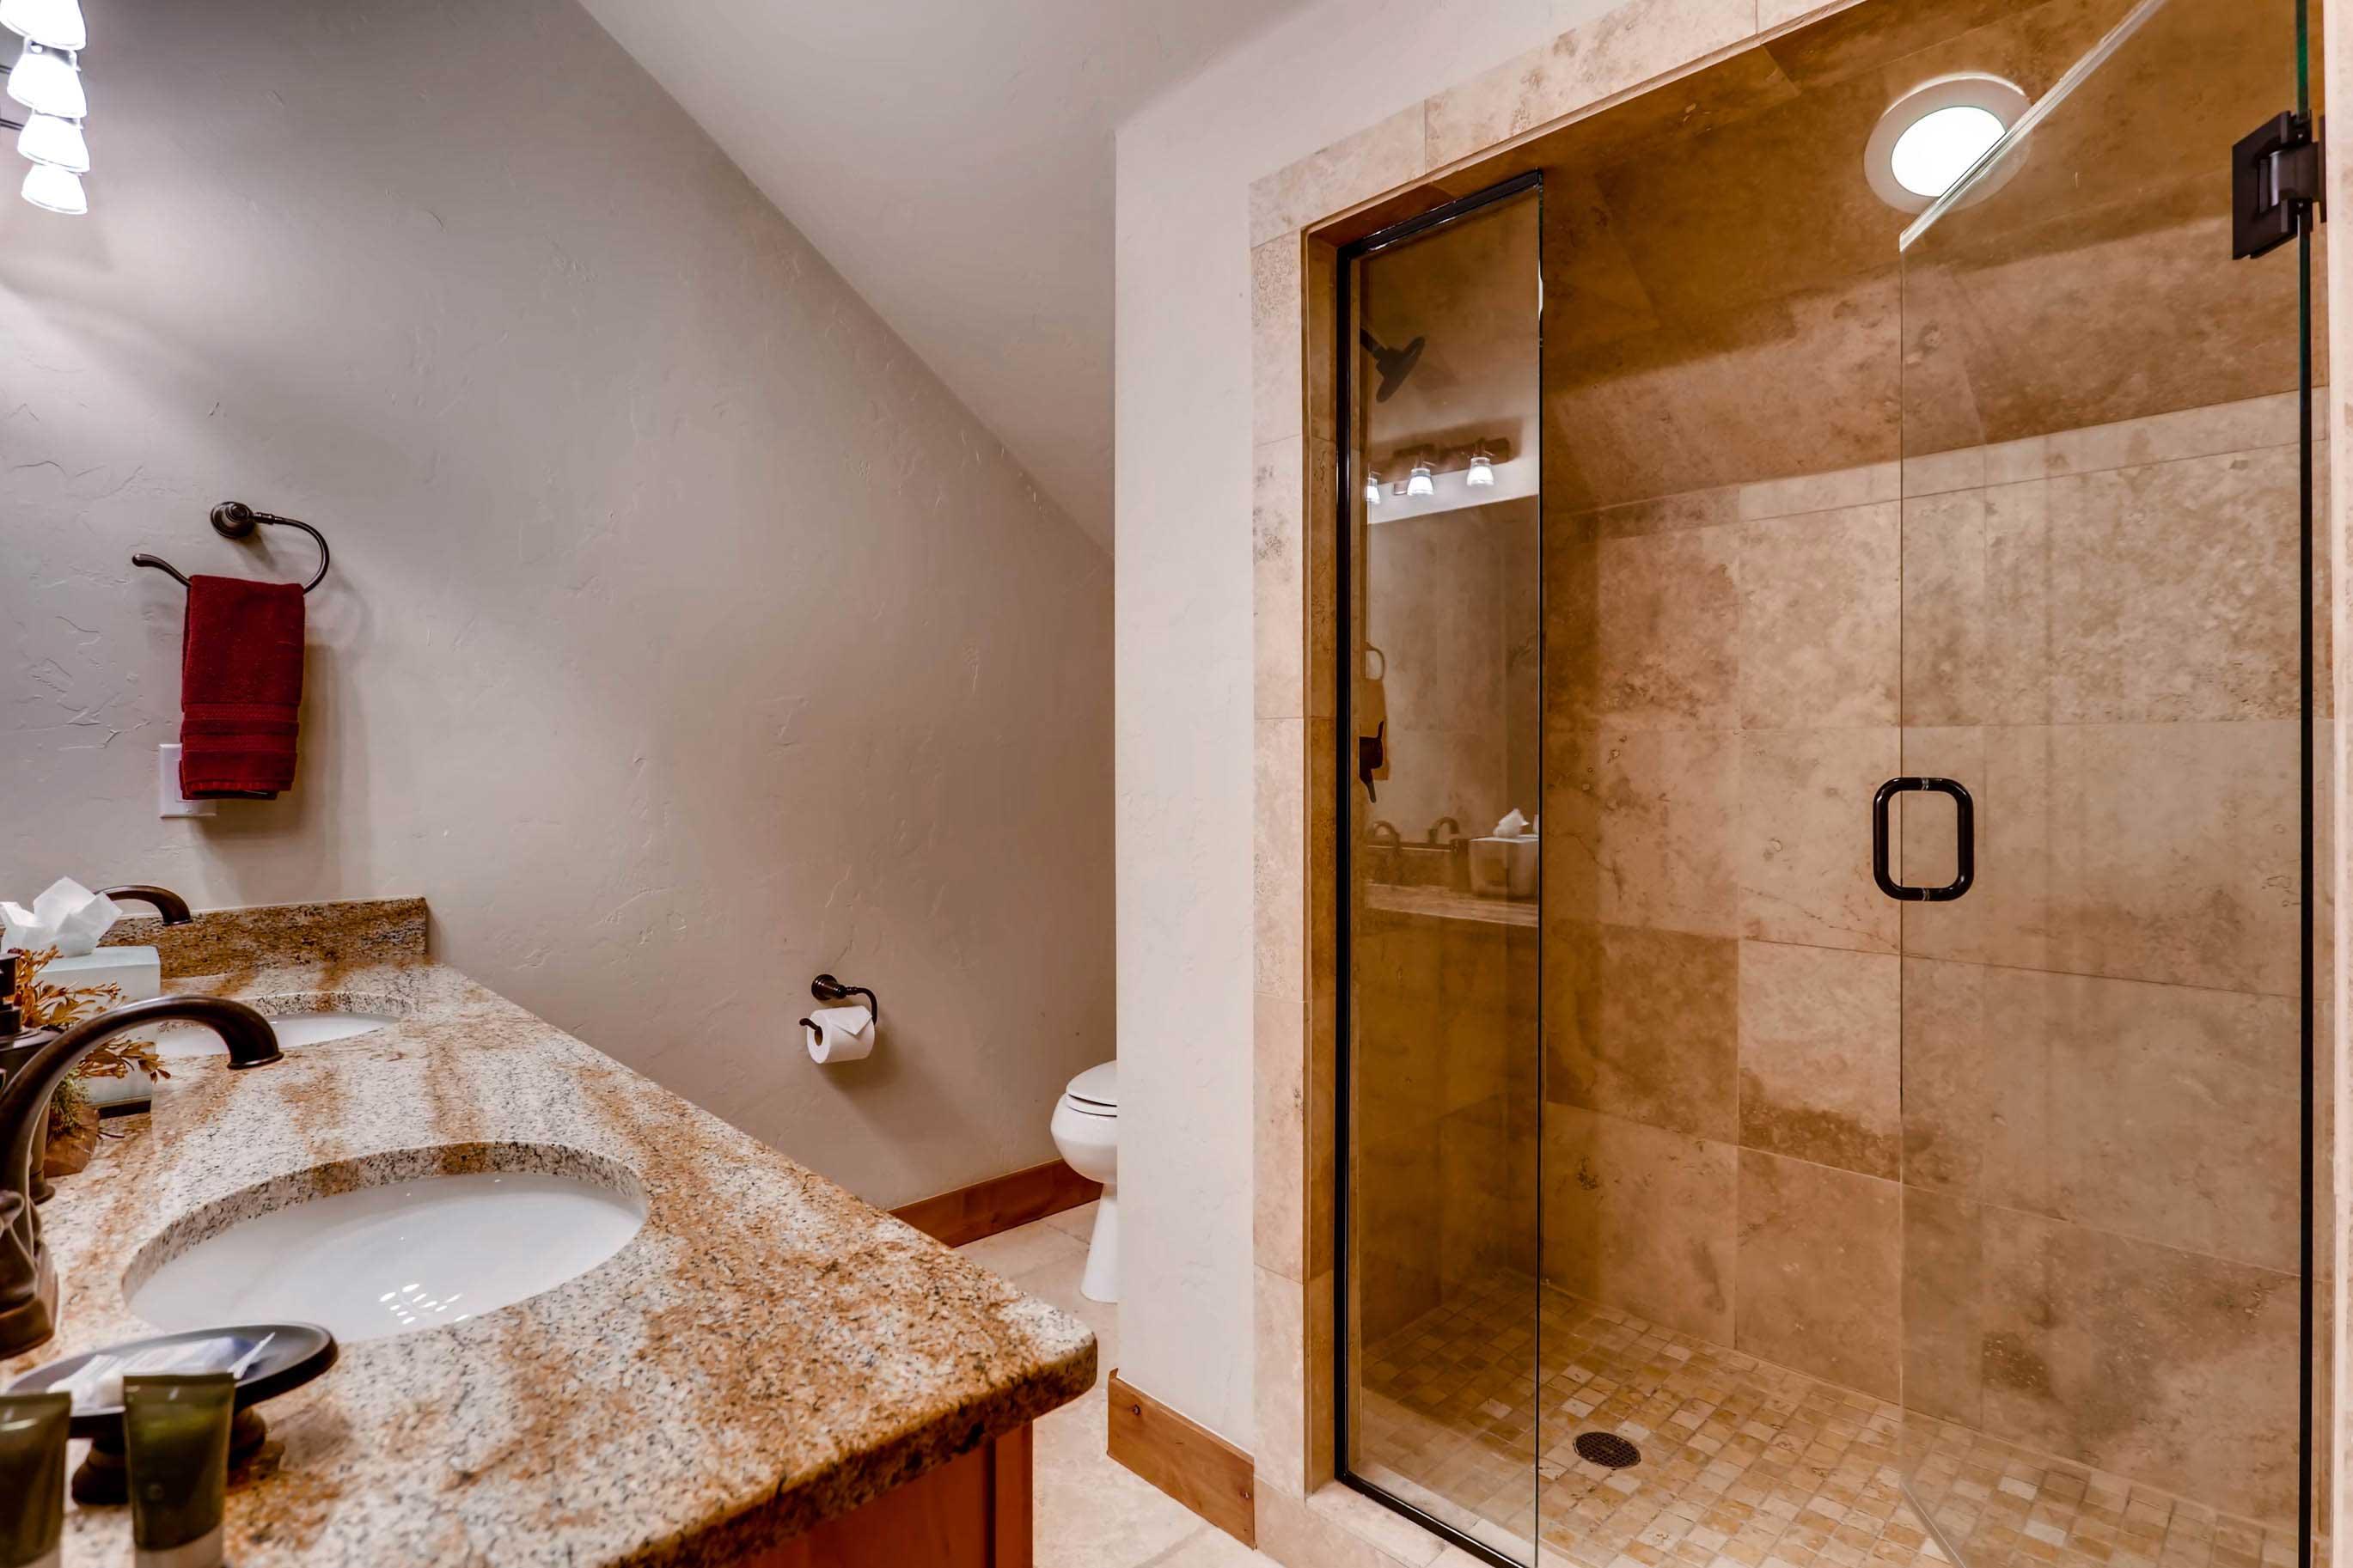 The second floor bathroom has a walk-in shower.